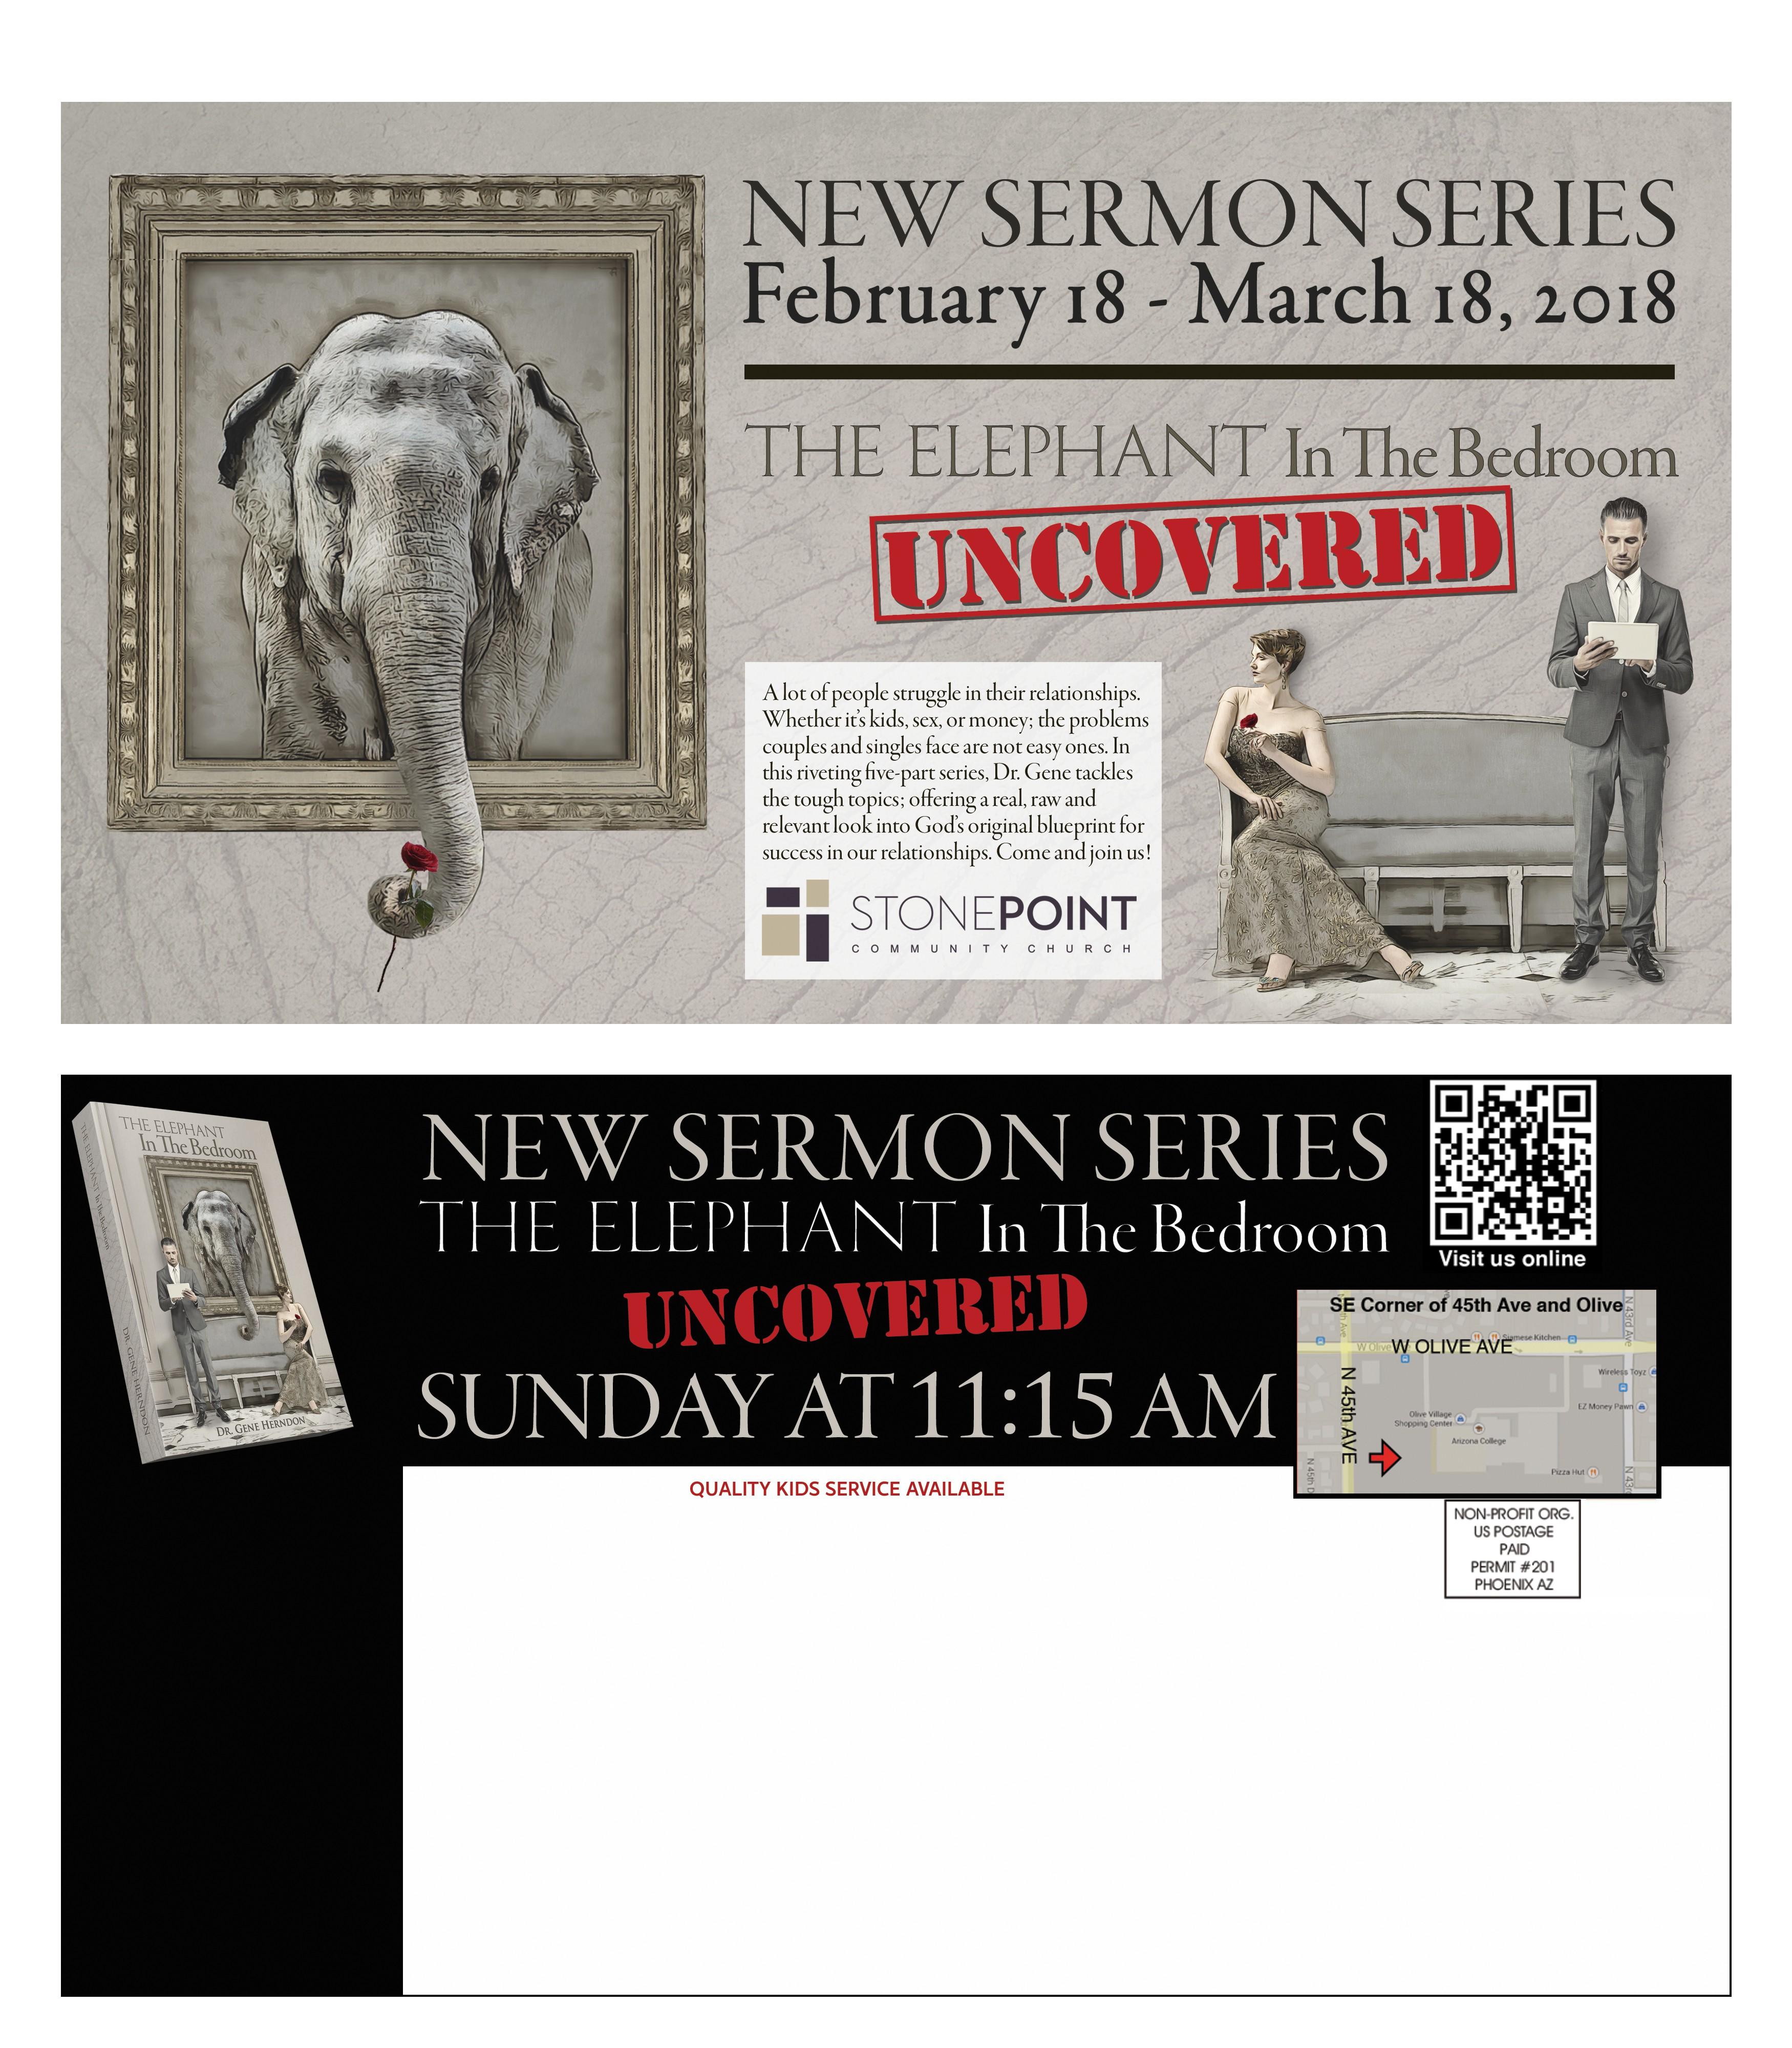 Elephant in the bedroom postcard mailer